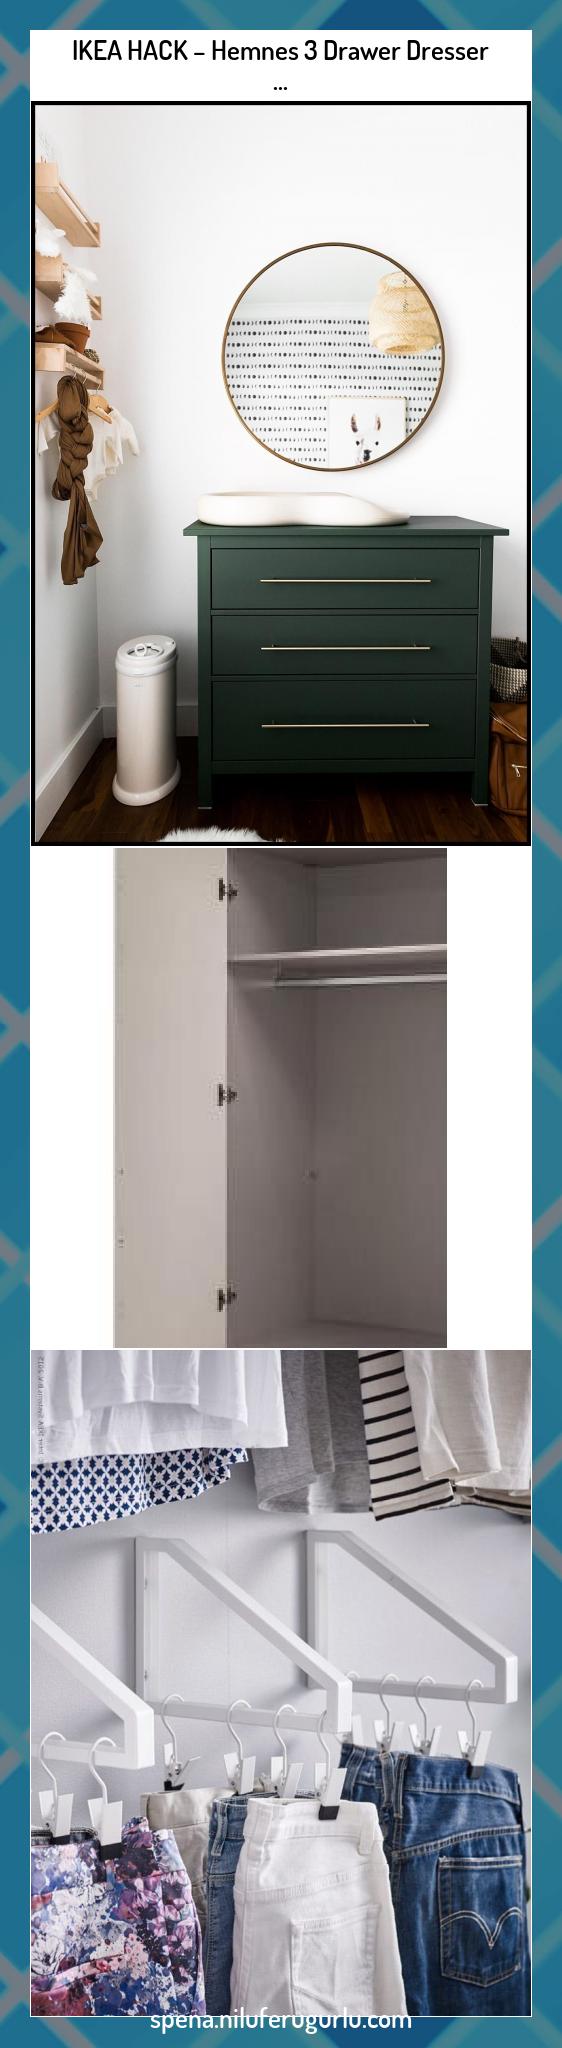 IKEA HACK - Hemnes 3 Drawer Dresser nel 2020